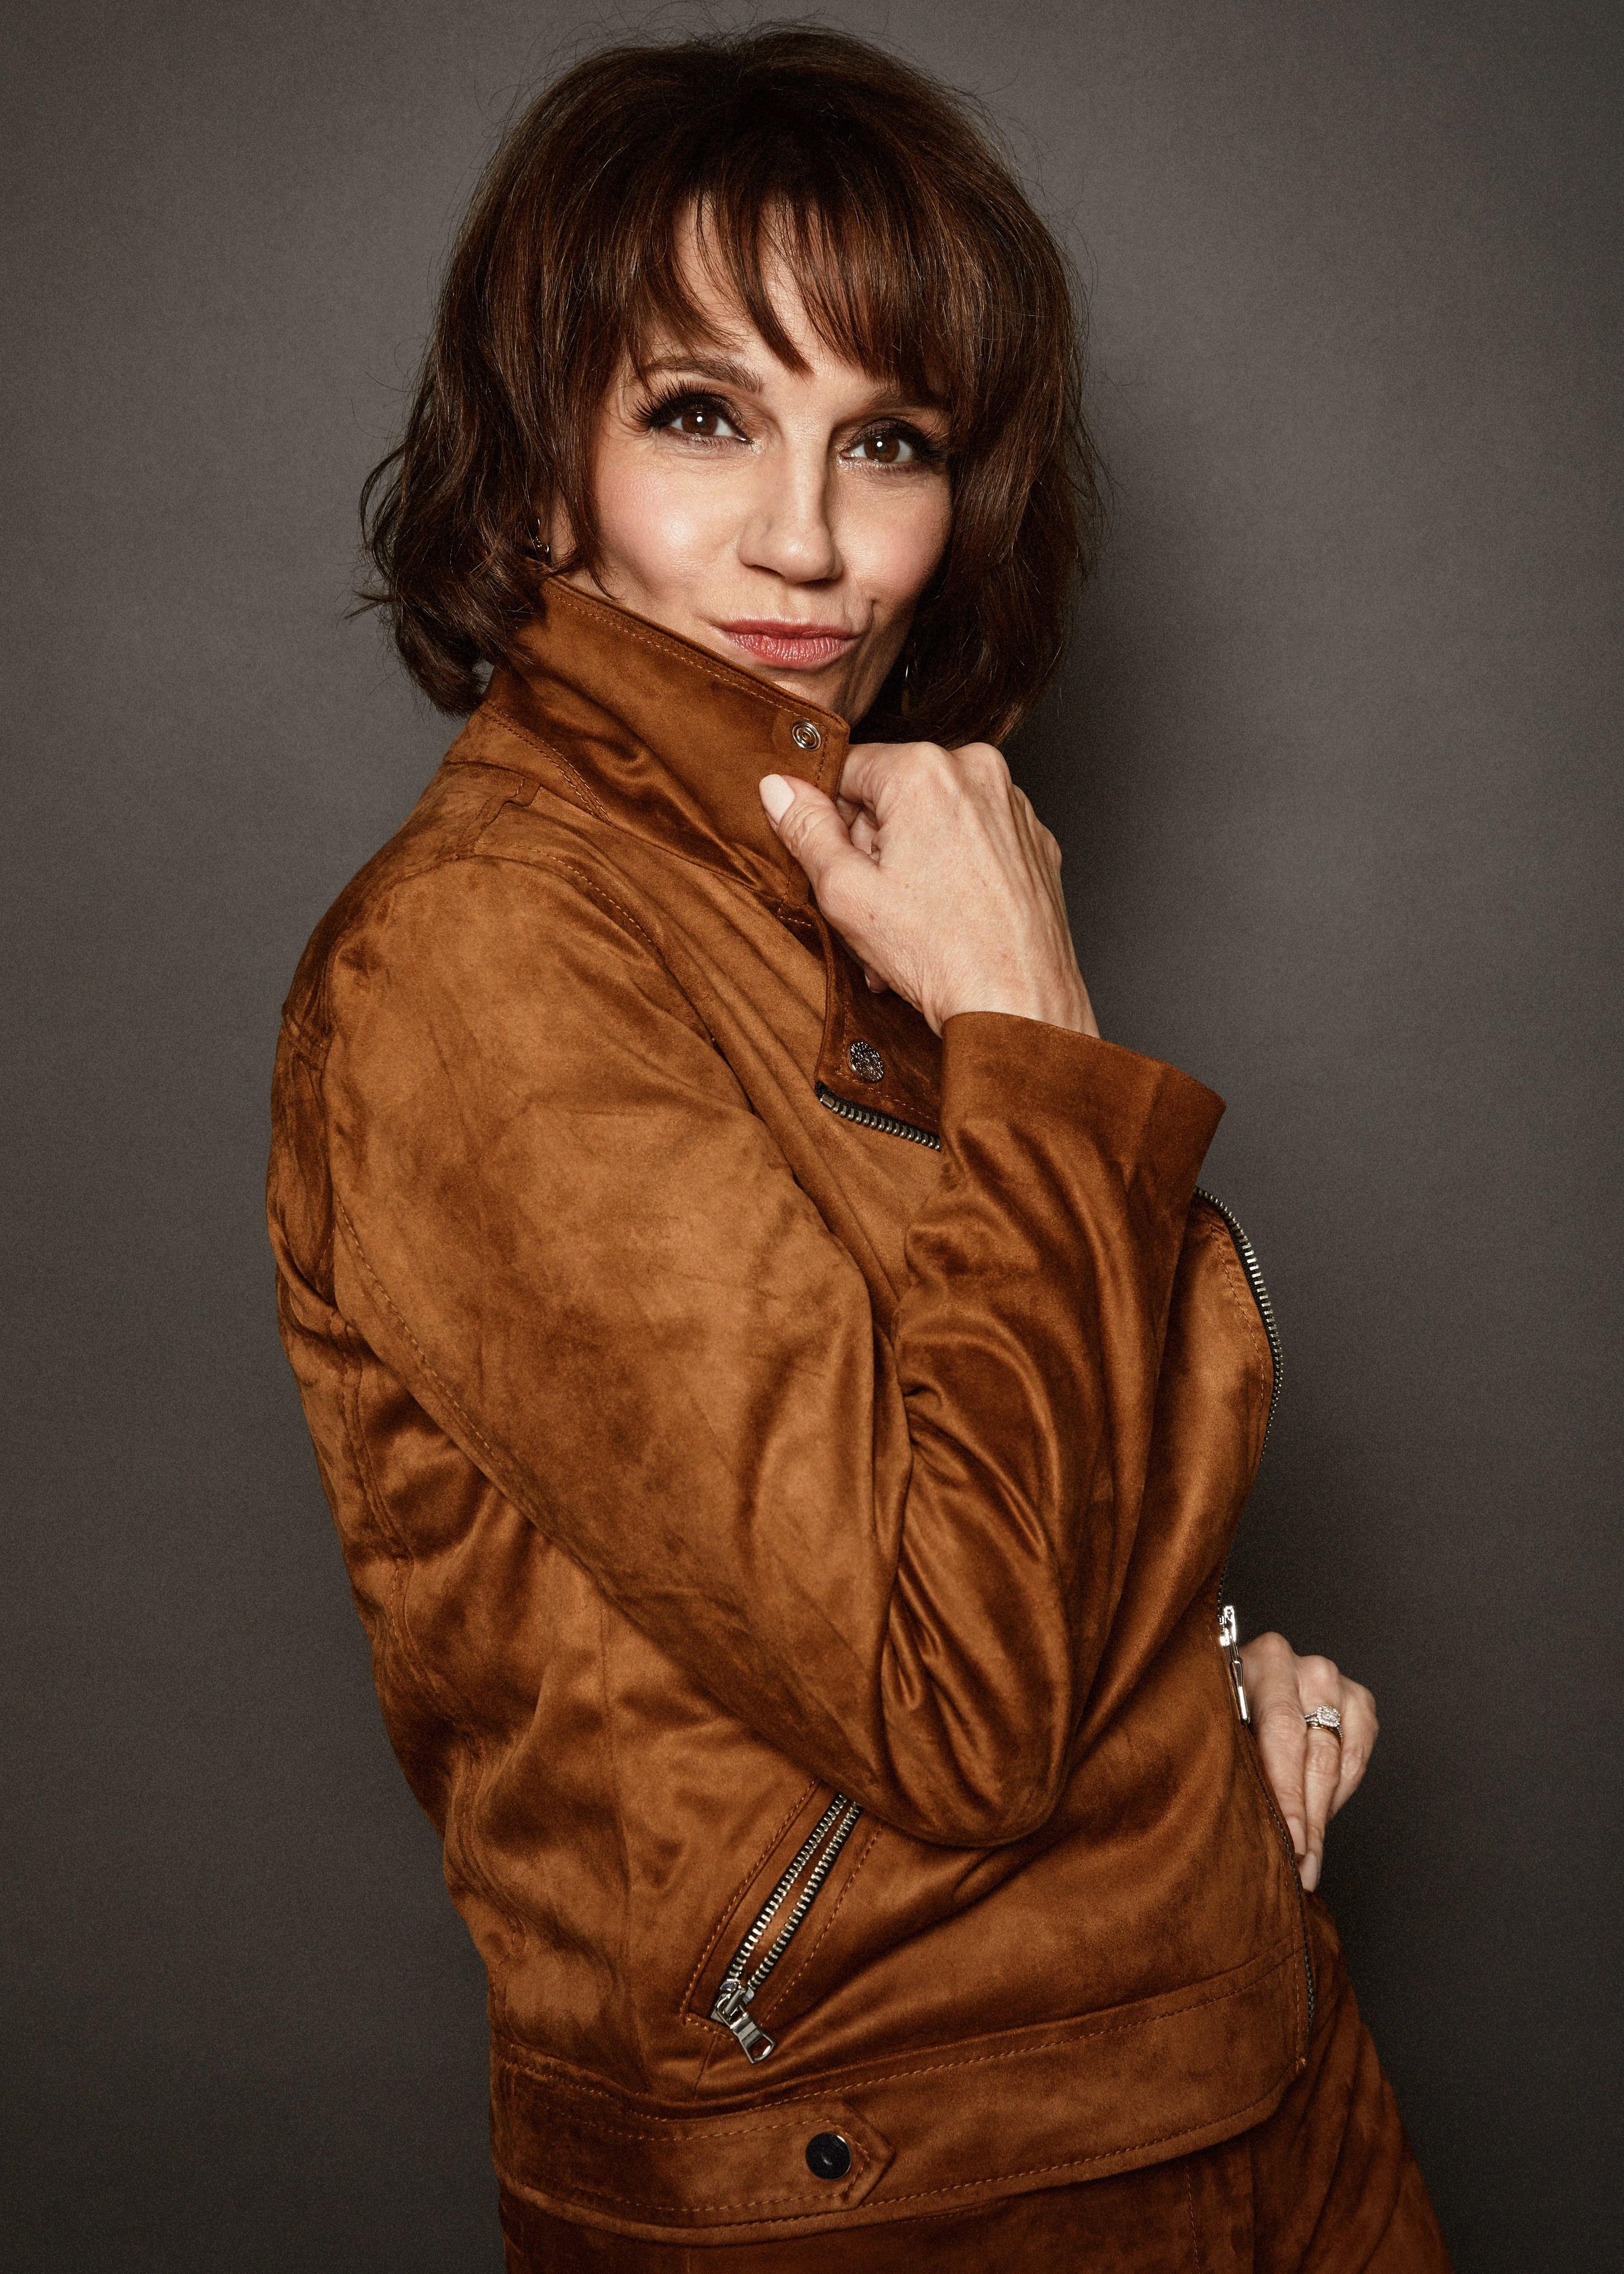 Beth posing in a suede jacket